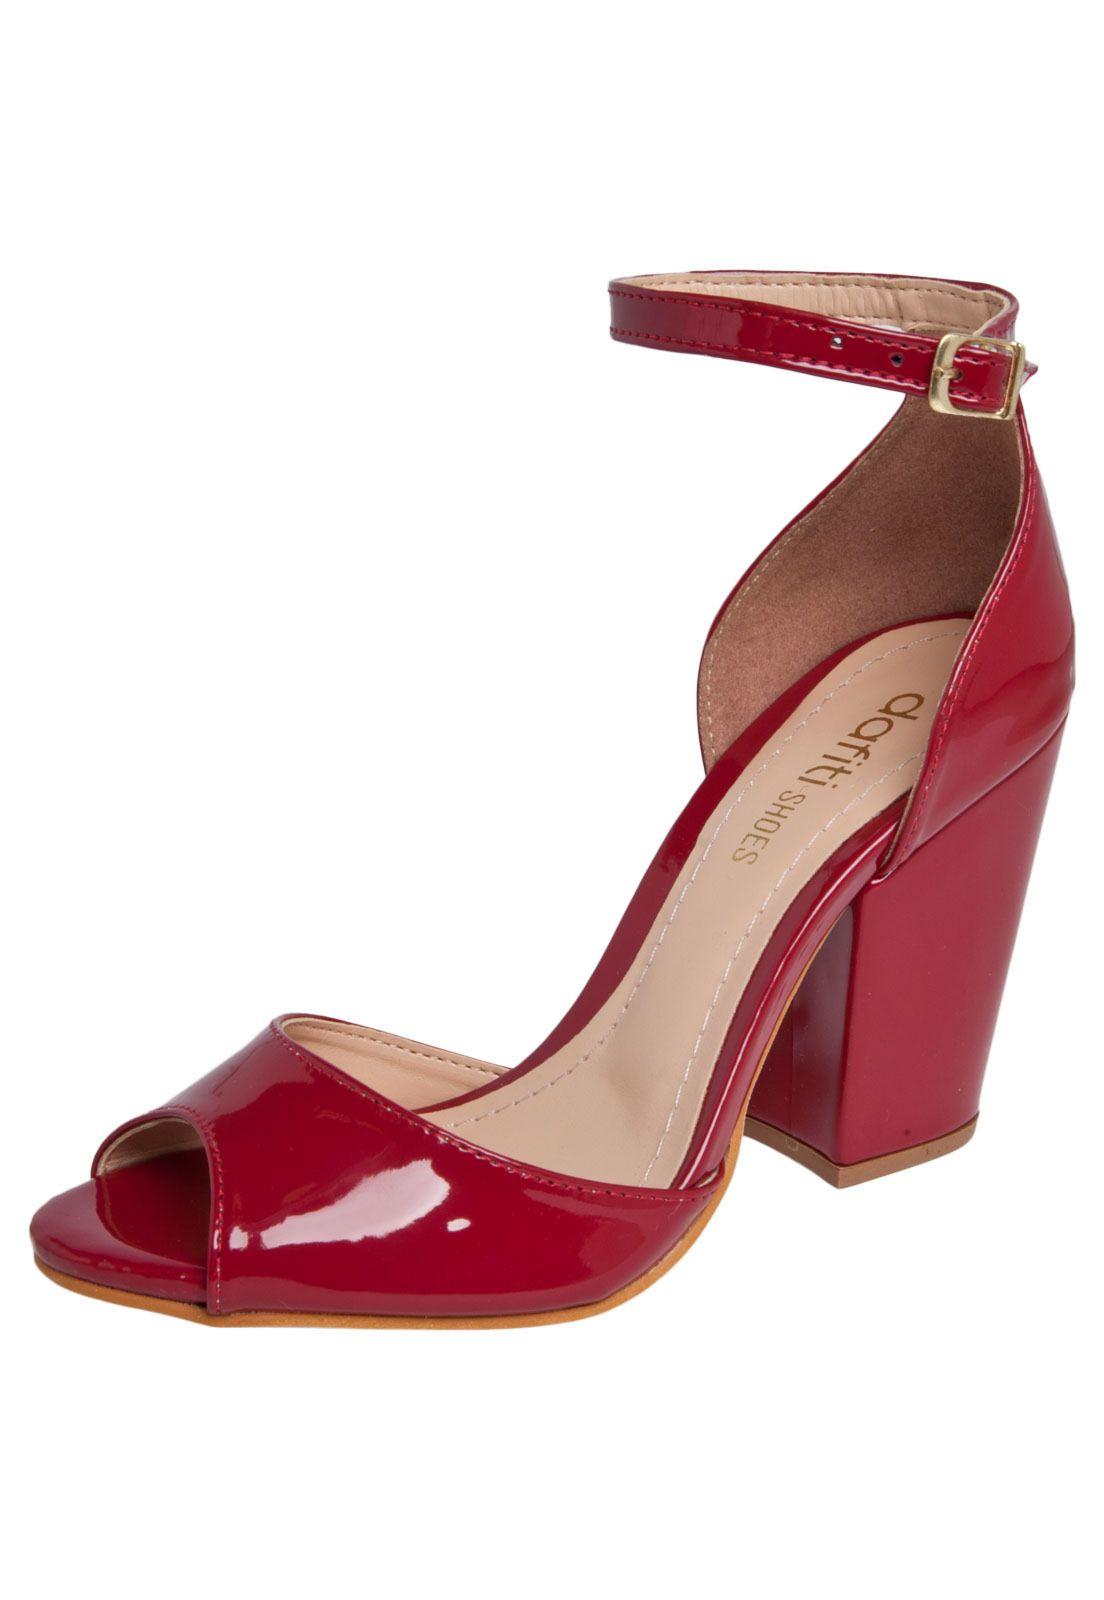 Sandália DAFITI SHOES Vermelha - Marca DAFITI SHOES f59731edce4